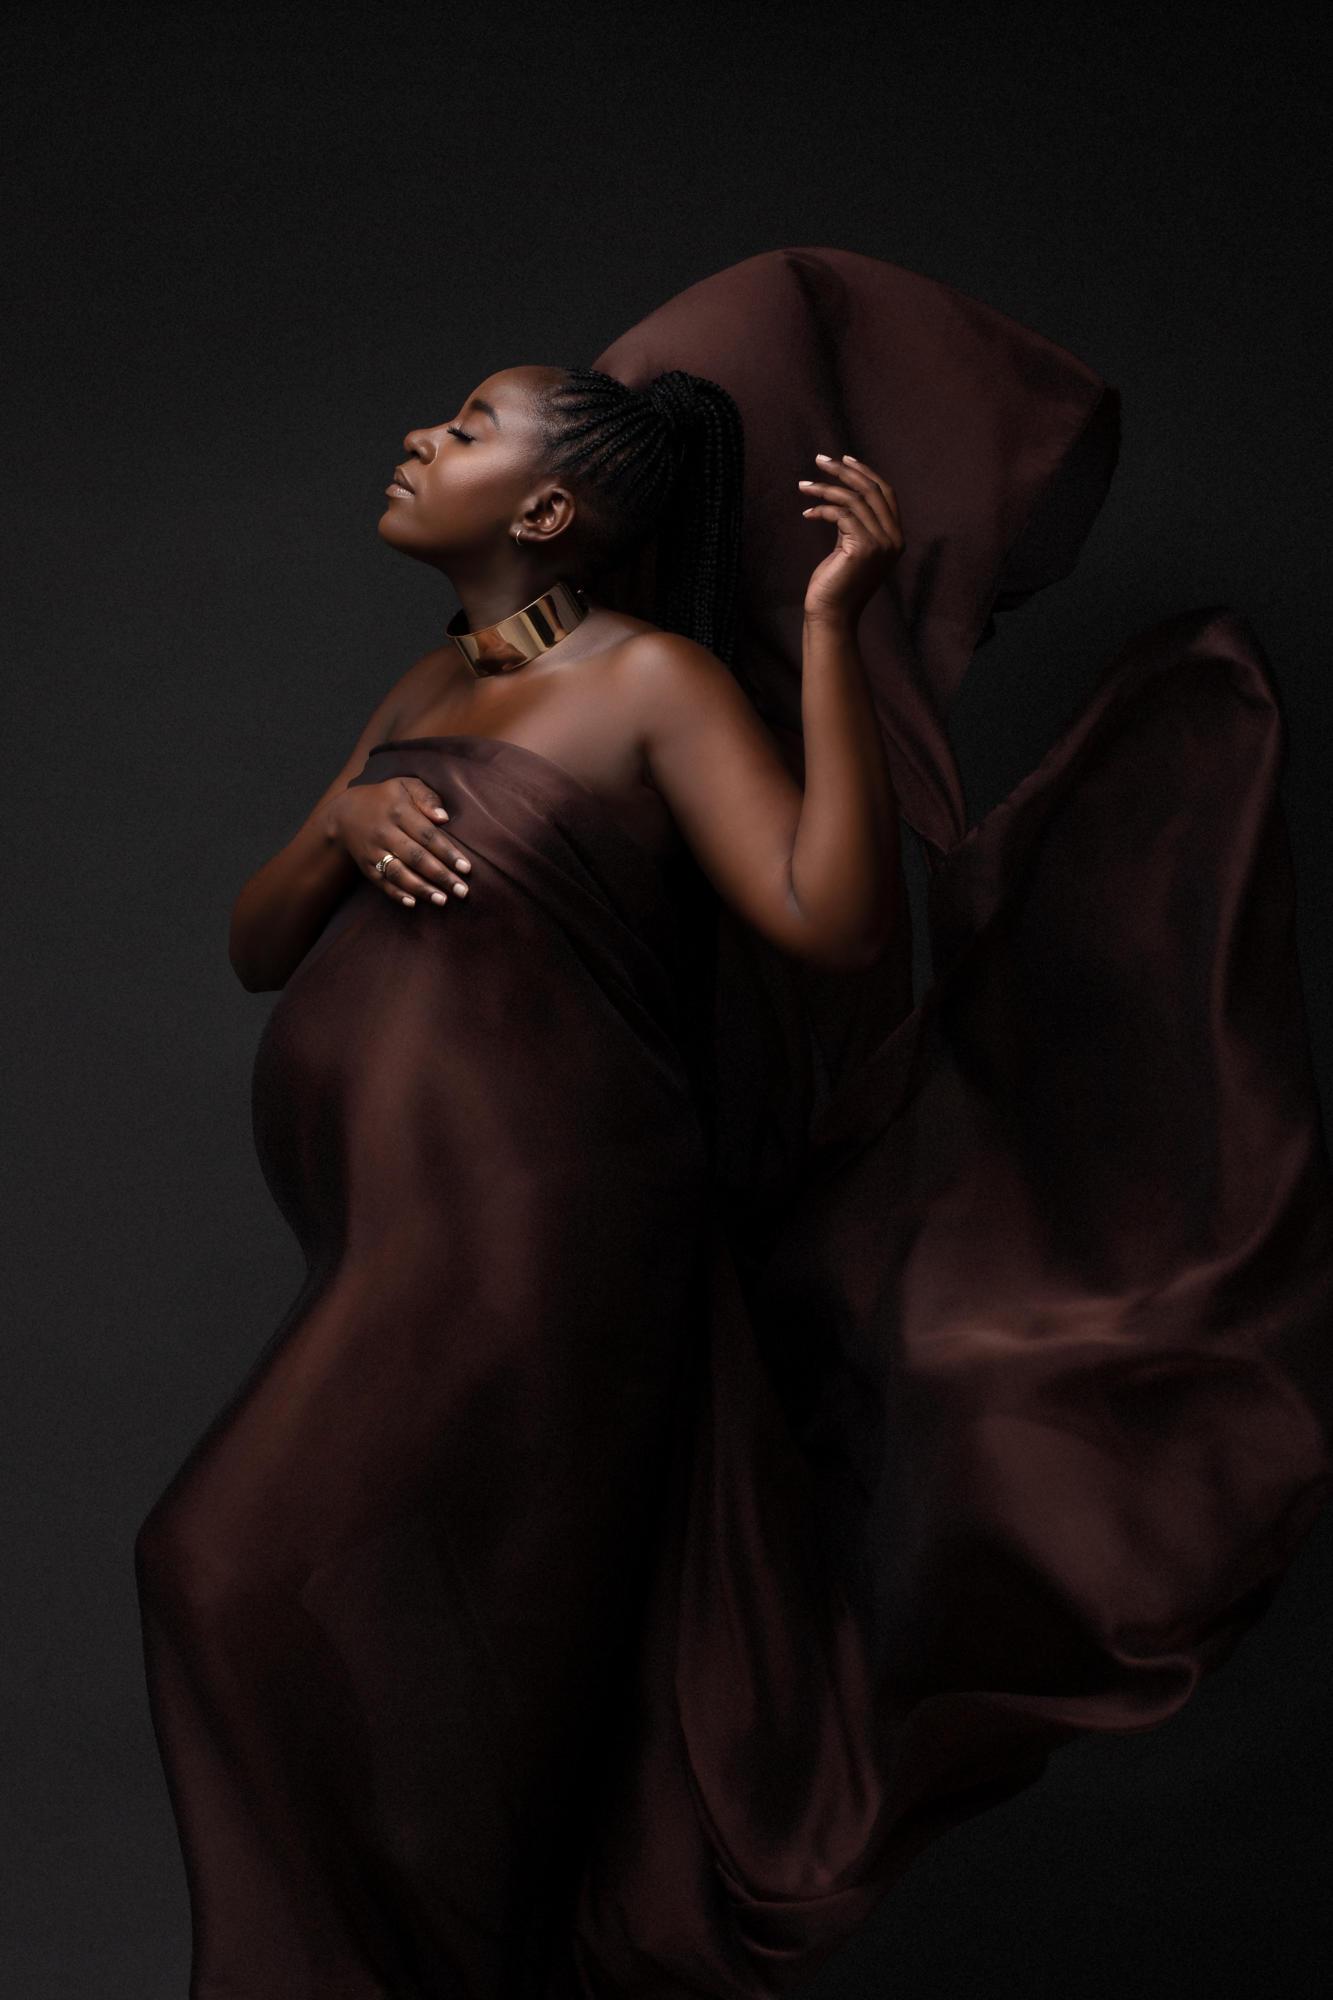 Floating Fabric Maternity Ideas Tianna J-Williams Photography Birmingham